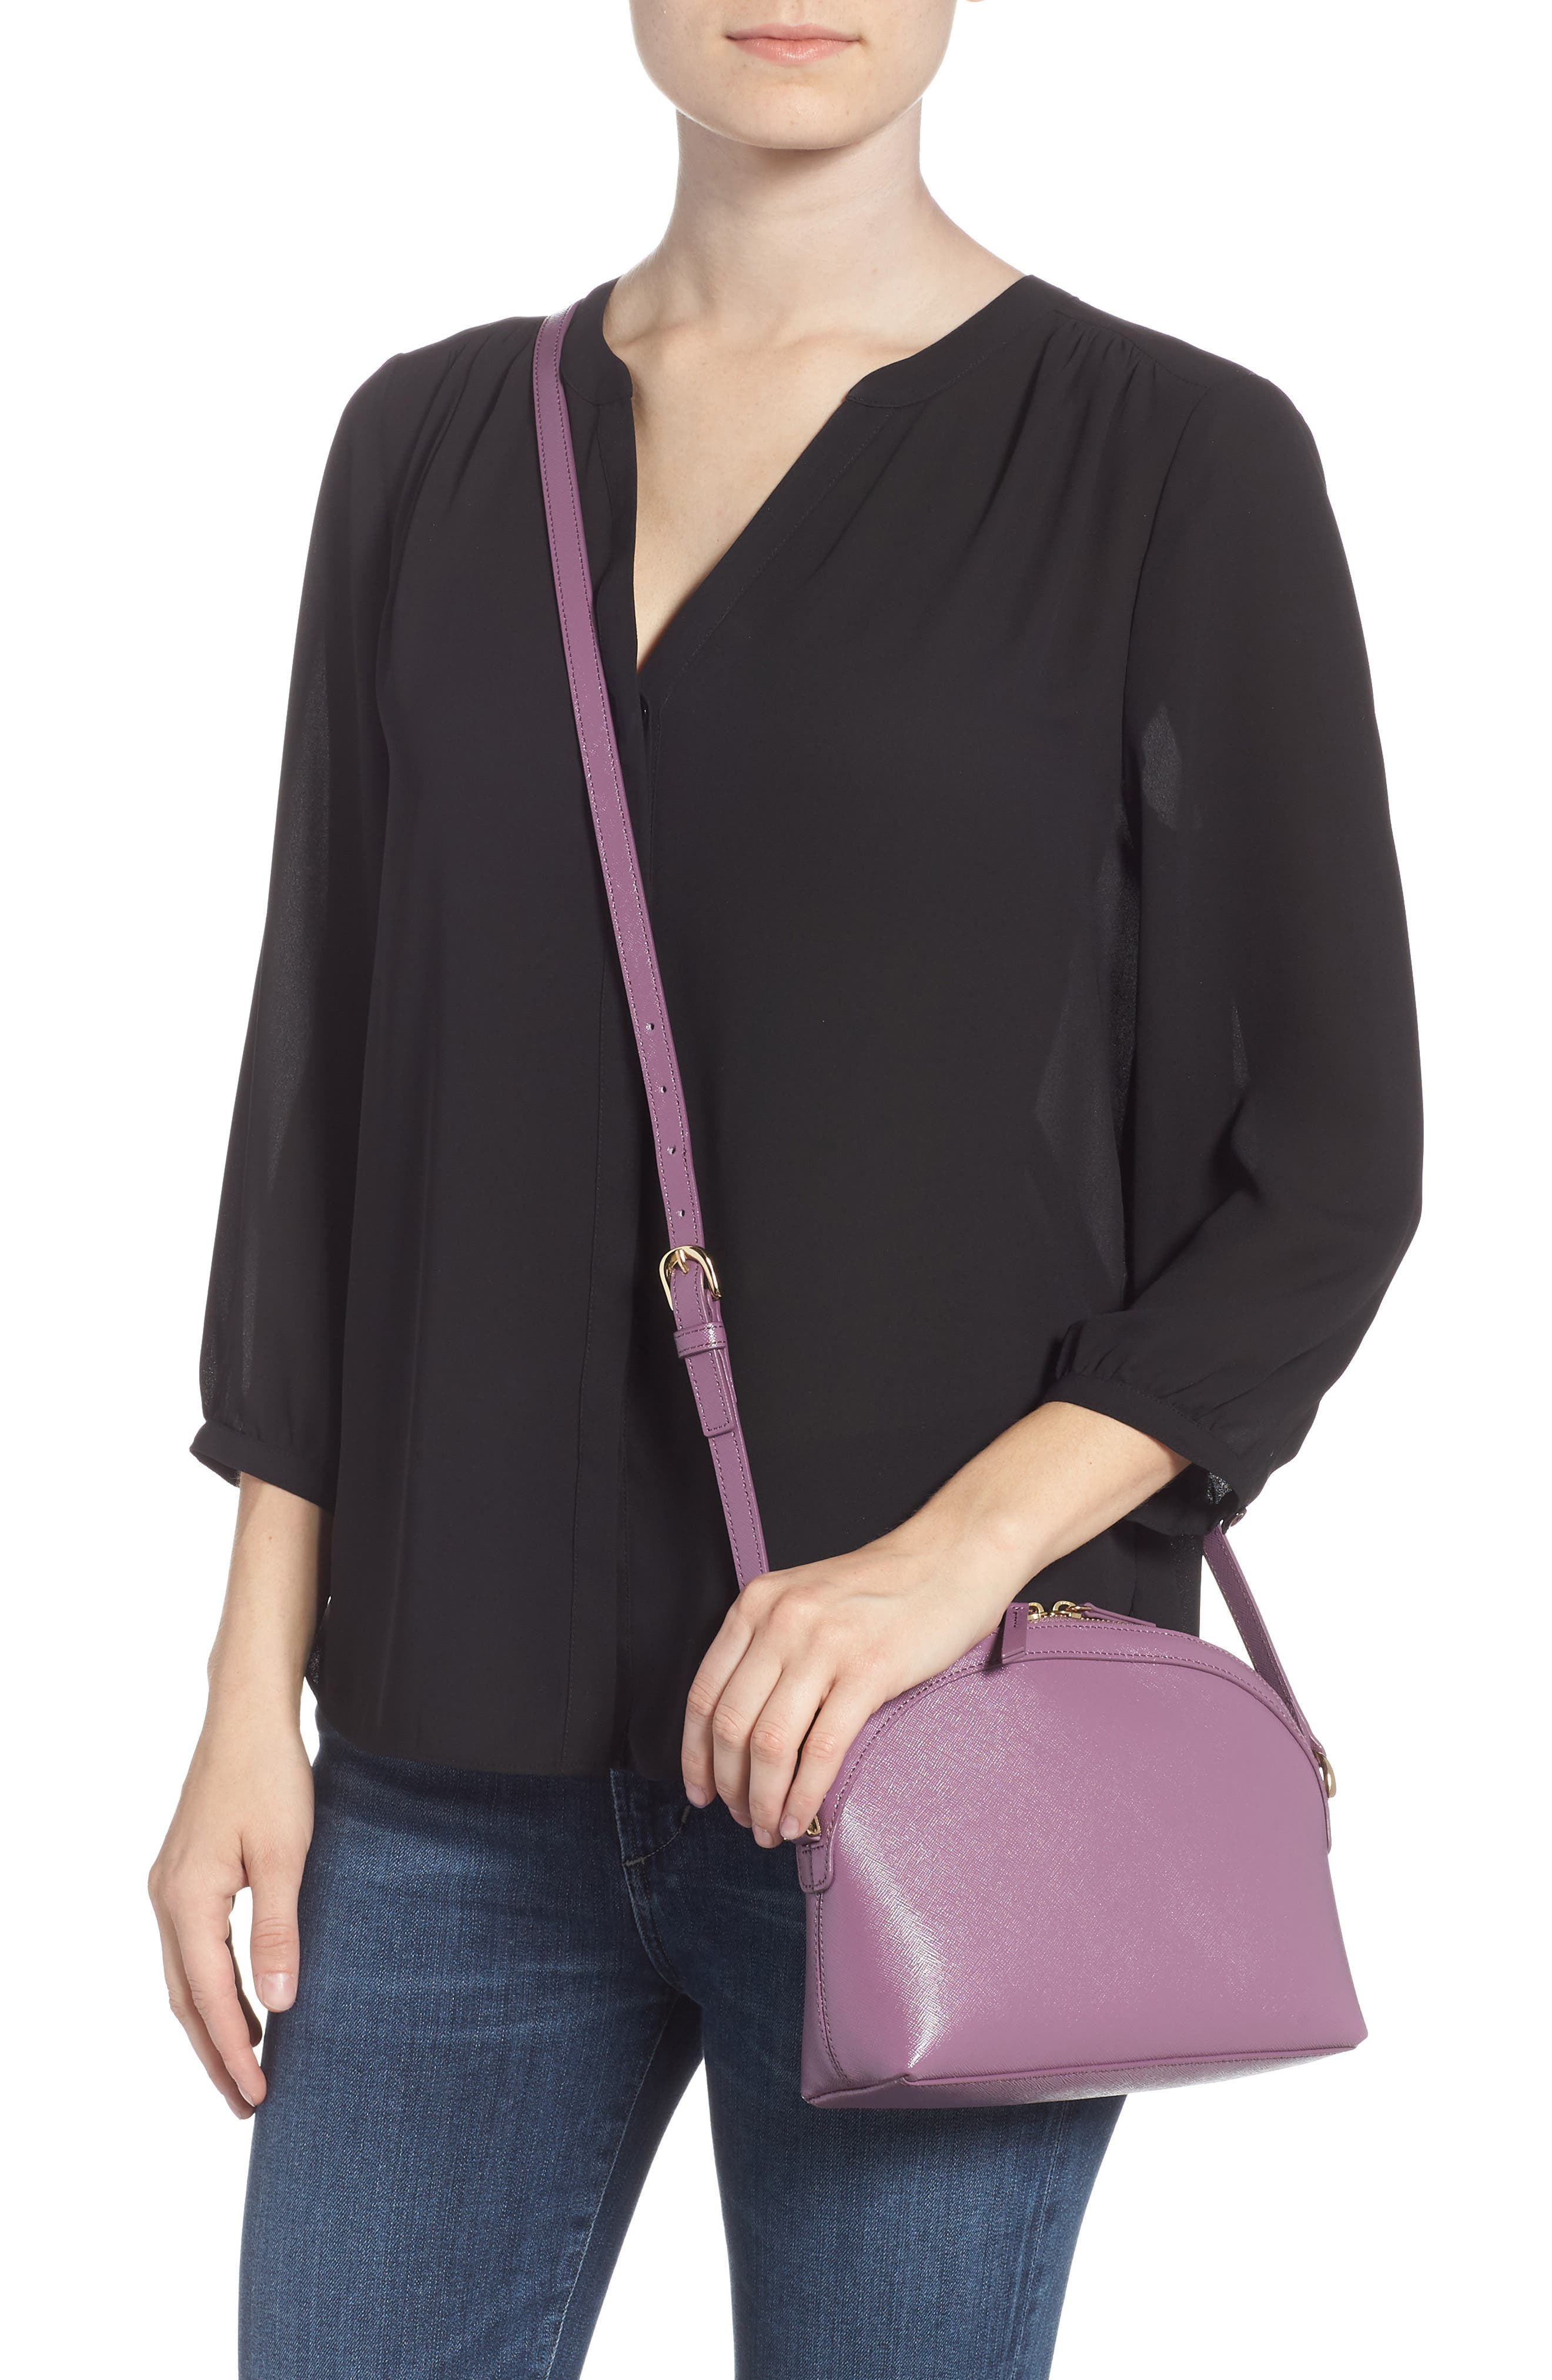 Isobel Half Moon Leather Crossbody Bag,                             Alternate thumbnail 2, color,                             PURPLE BETTA